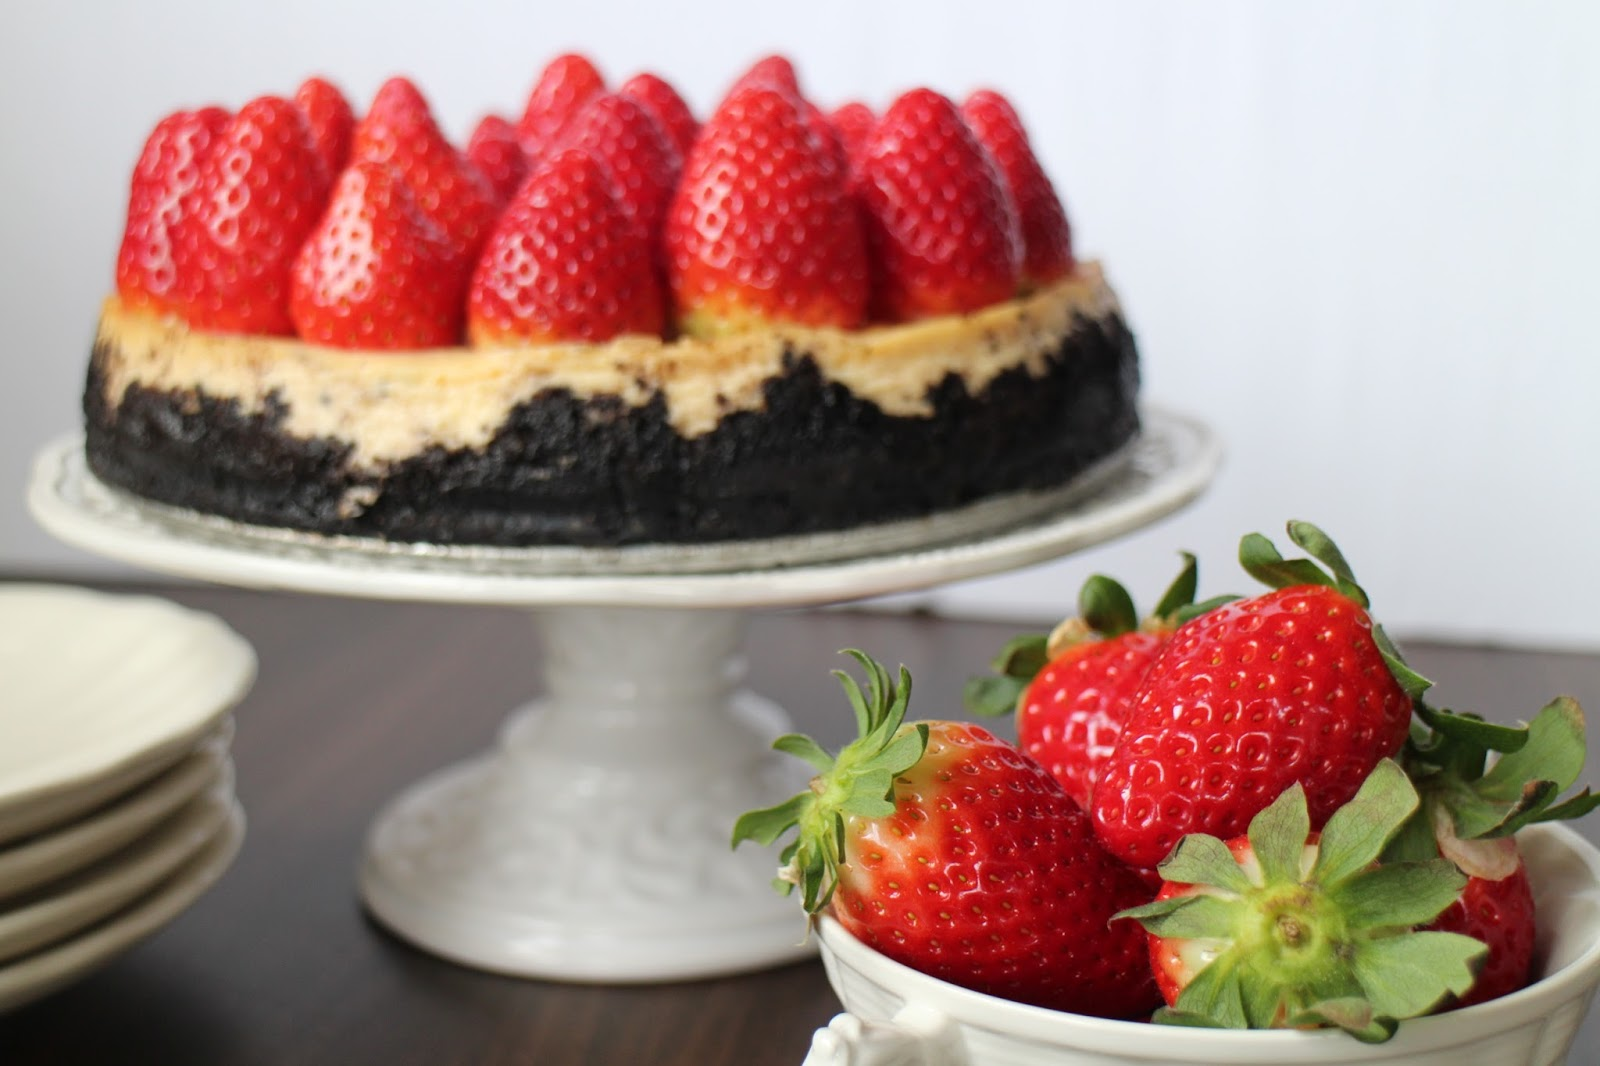 strawberry-cheesecake, cheesecake-de-fresas